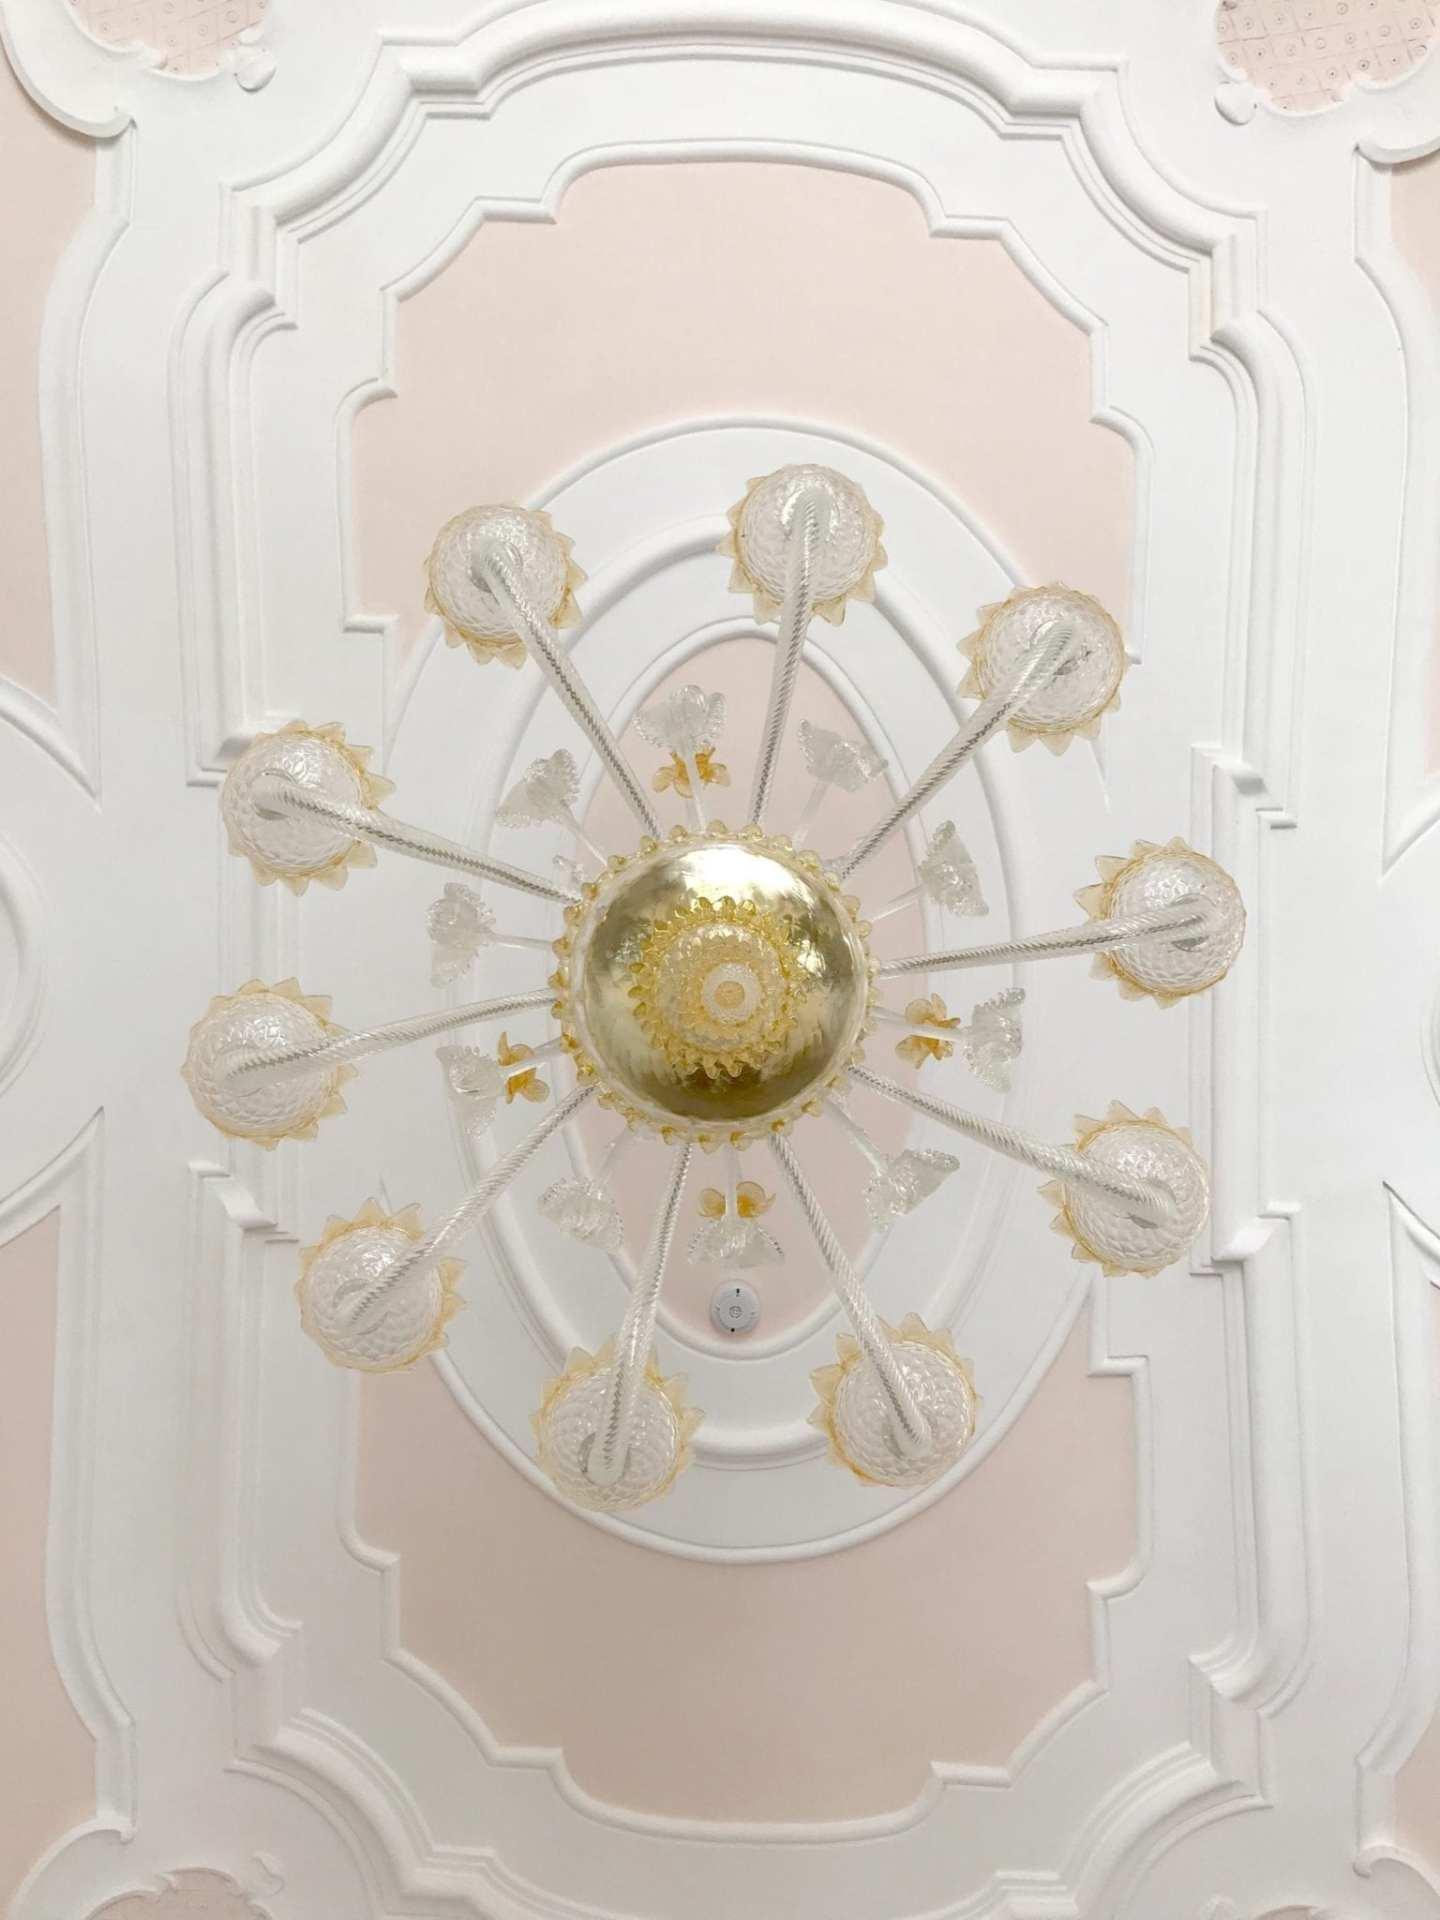 Villa Rufolo chandelier with pink ceiling.